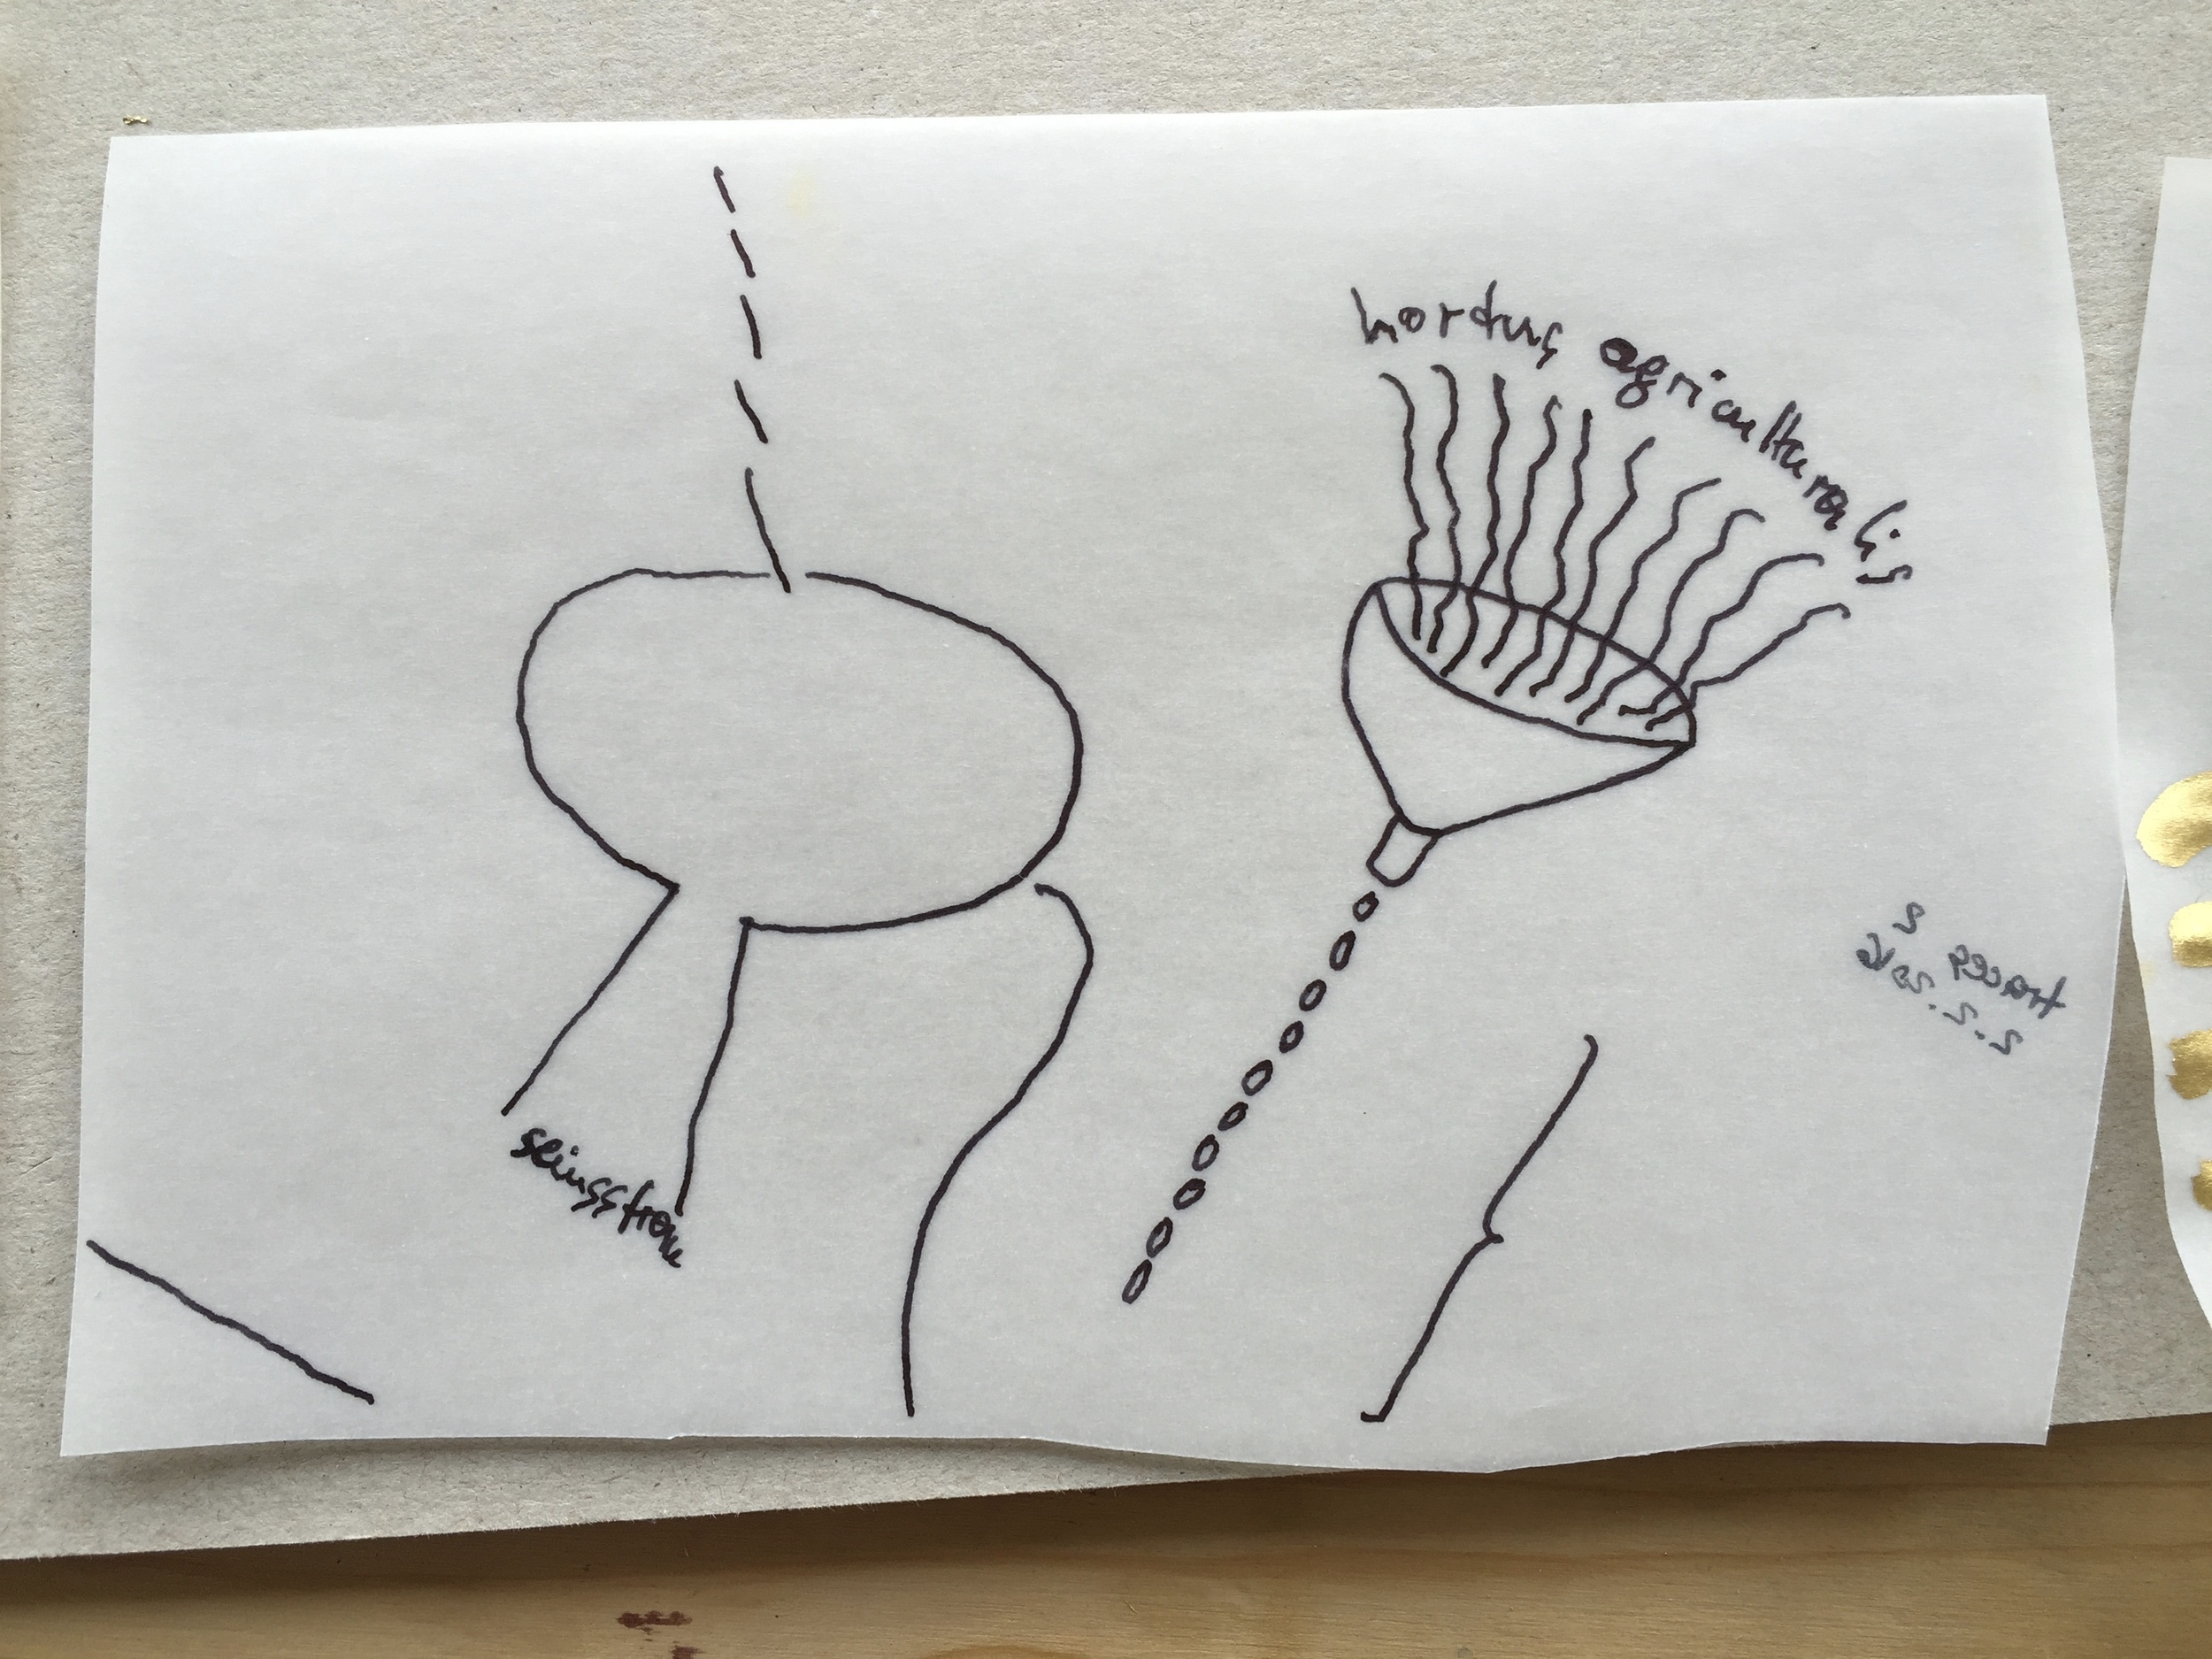 < traces ii . hortus agriculturalis > . zustand vor ueber.arbeitung